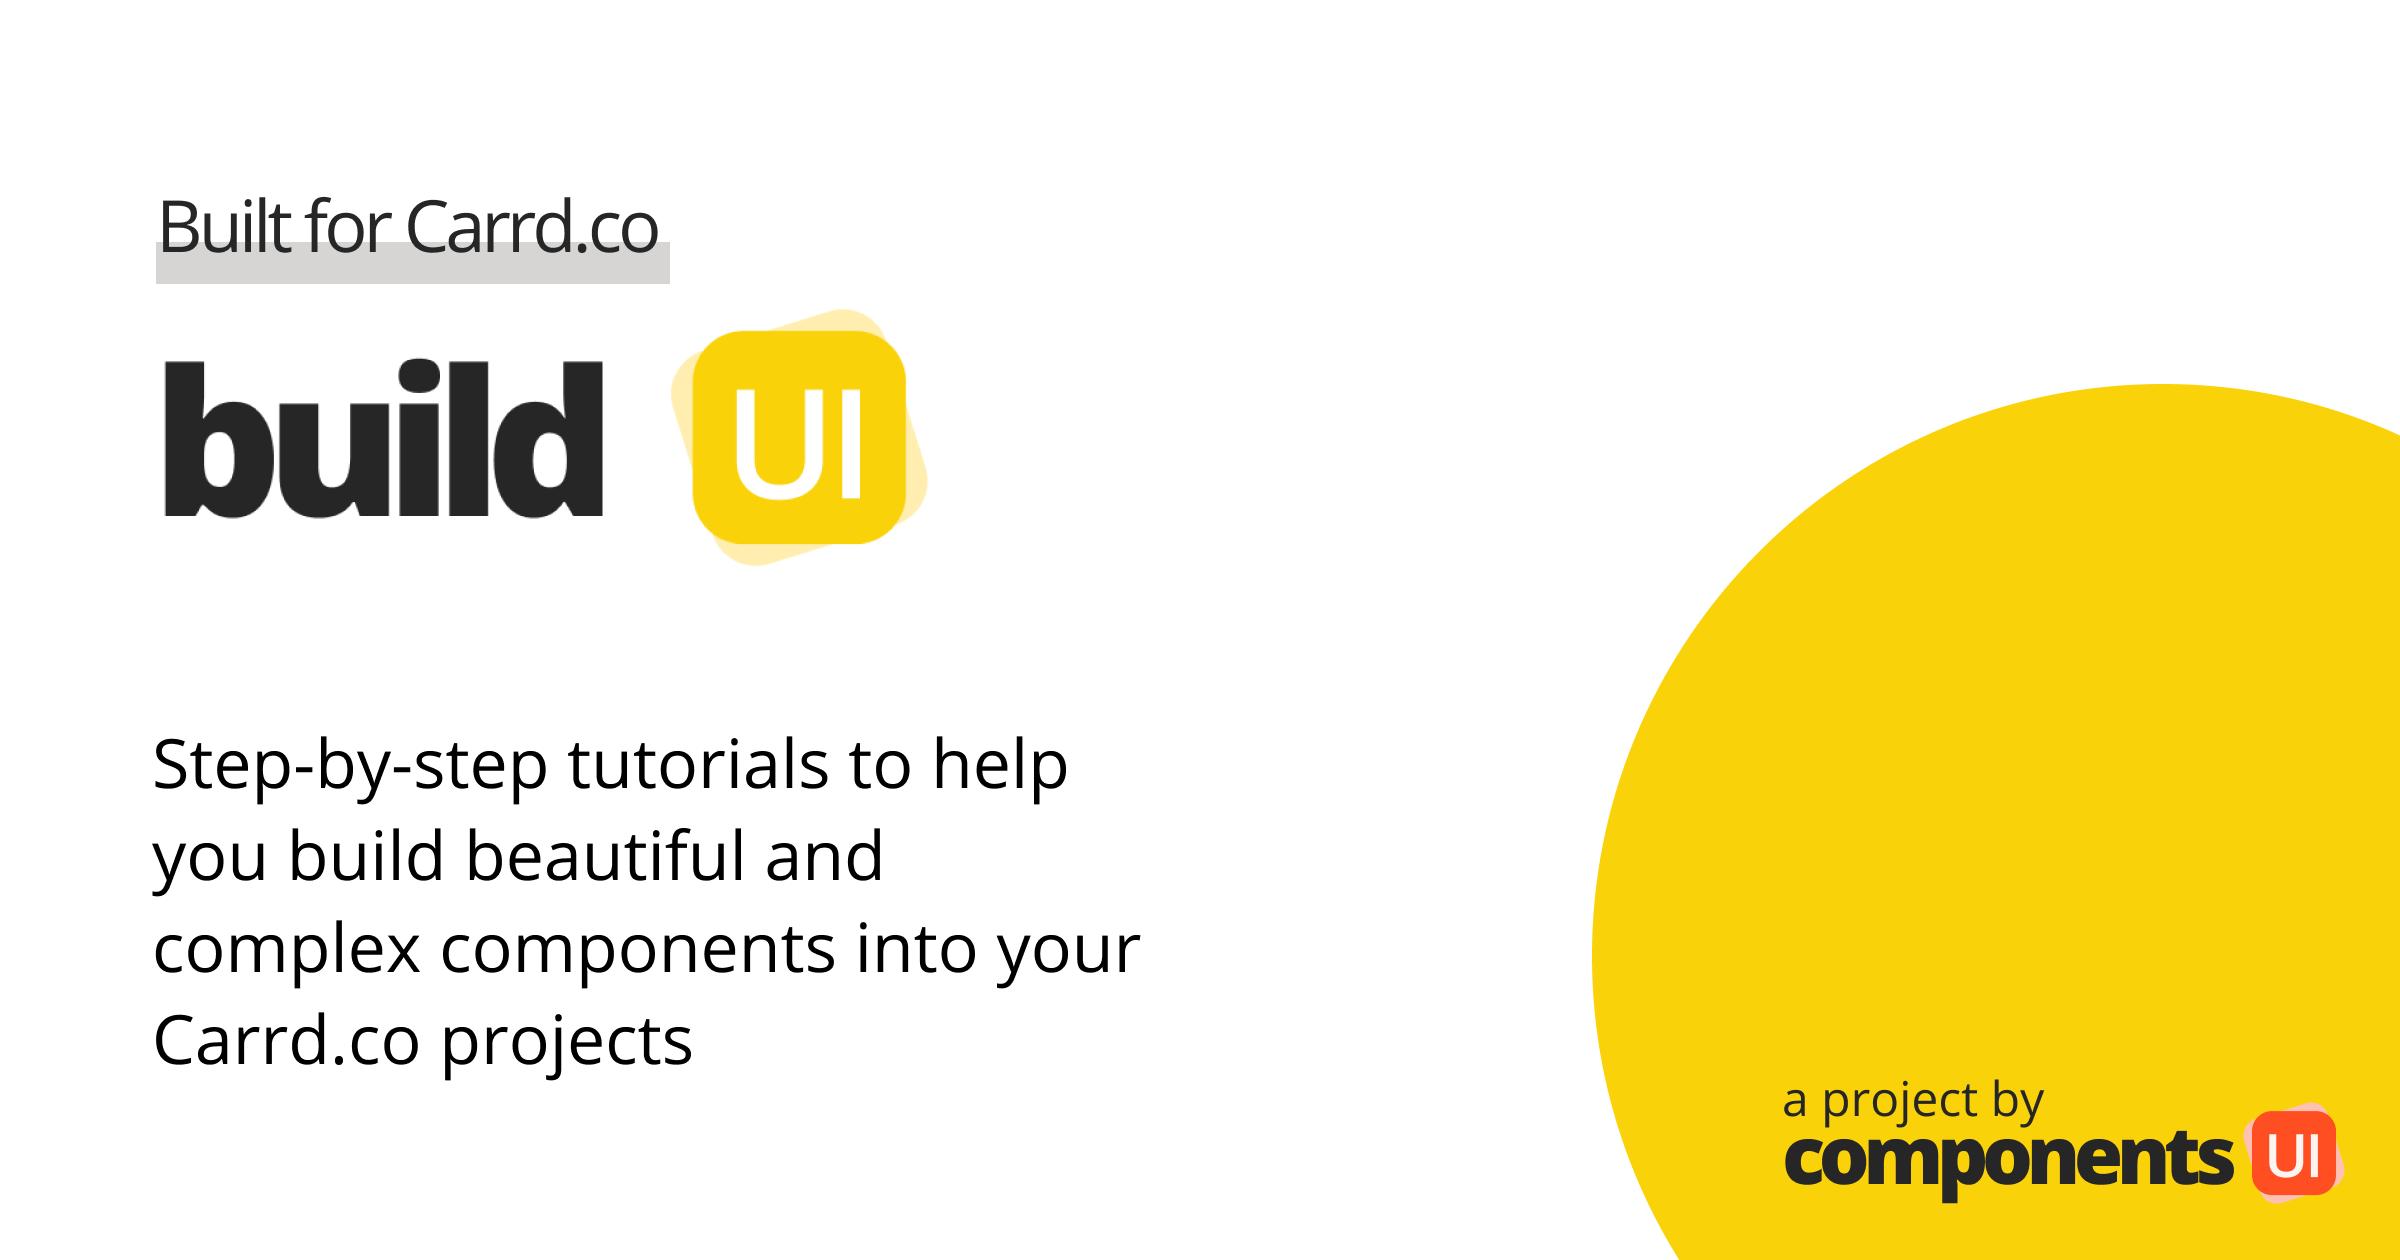 https://componentsui.com/build/